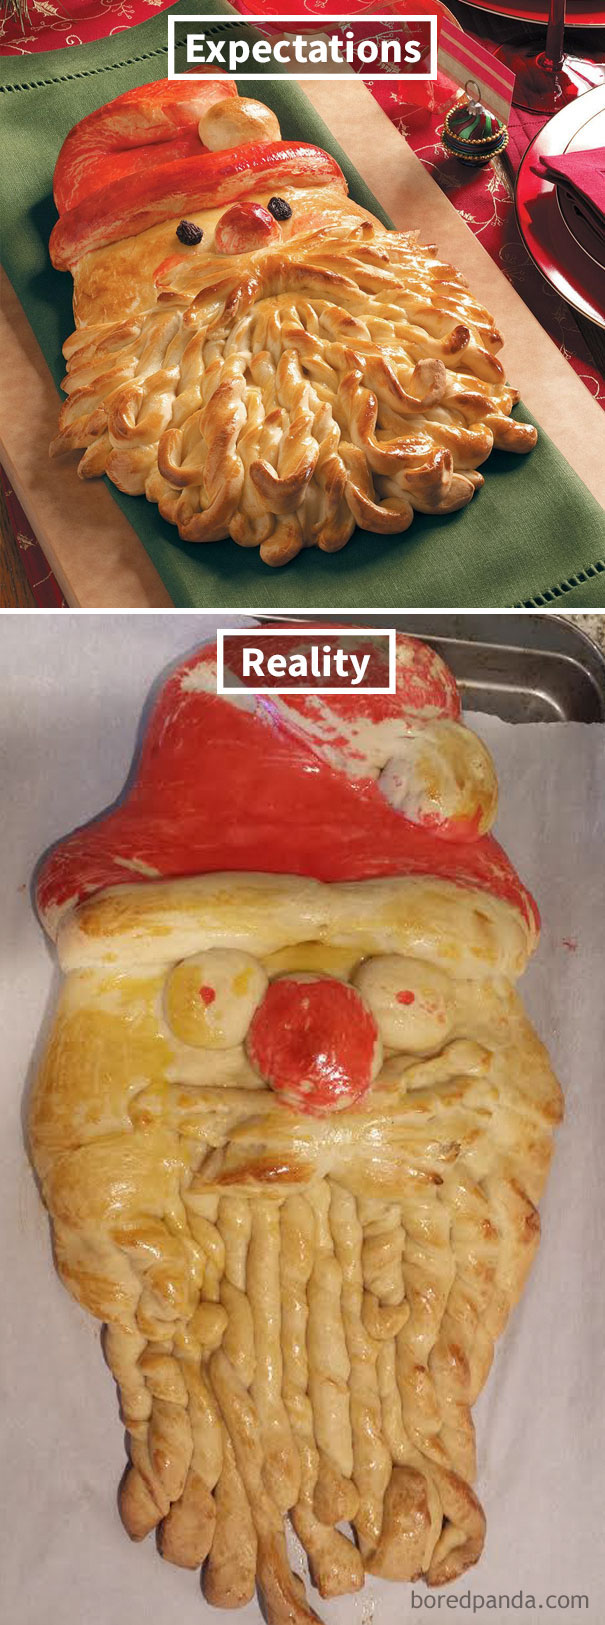 funny food fails expectations vs reality 104 5a5320a436393  605 - 25+ כשלונות בישול שיגרום לך למות מצחוק